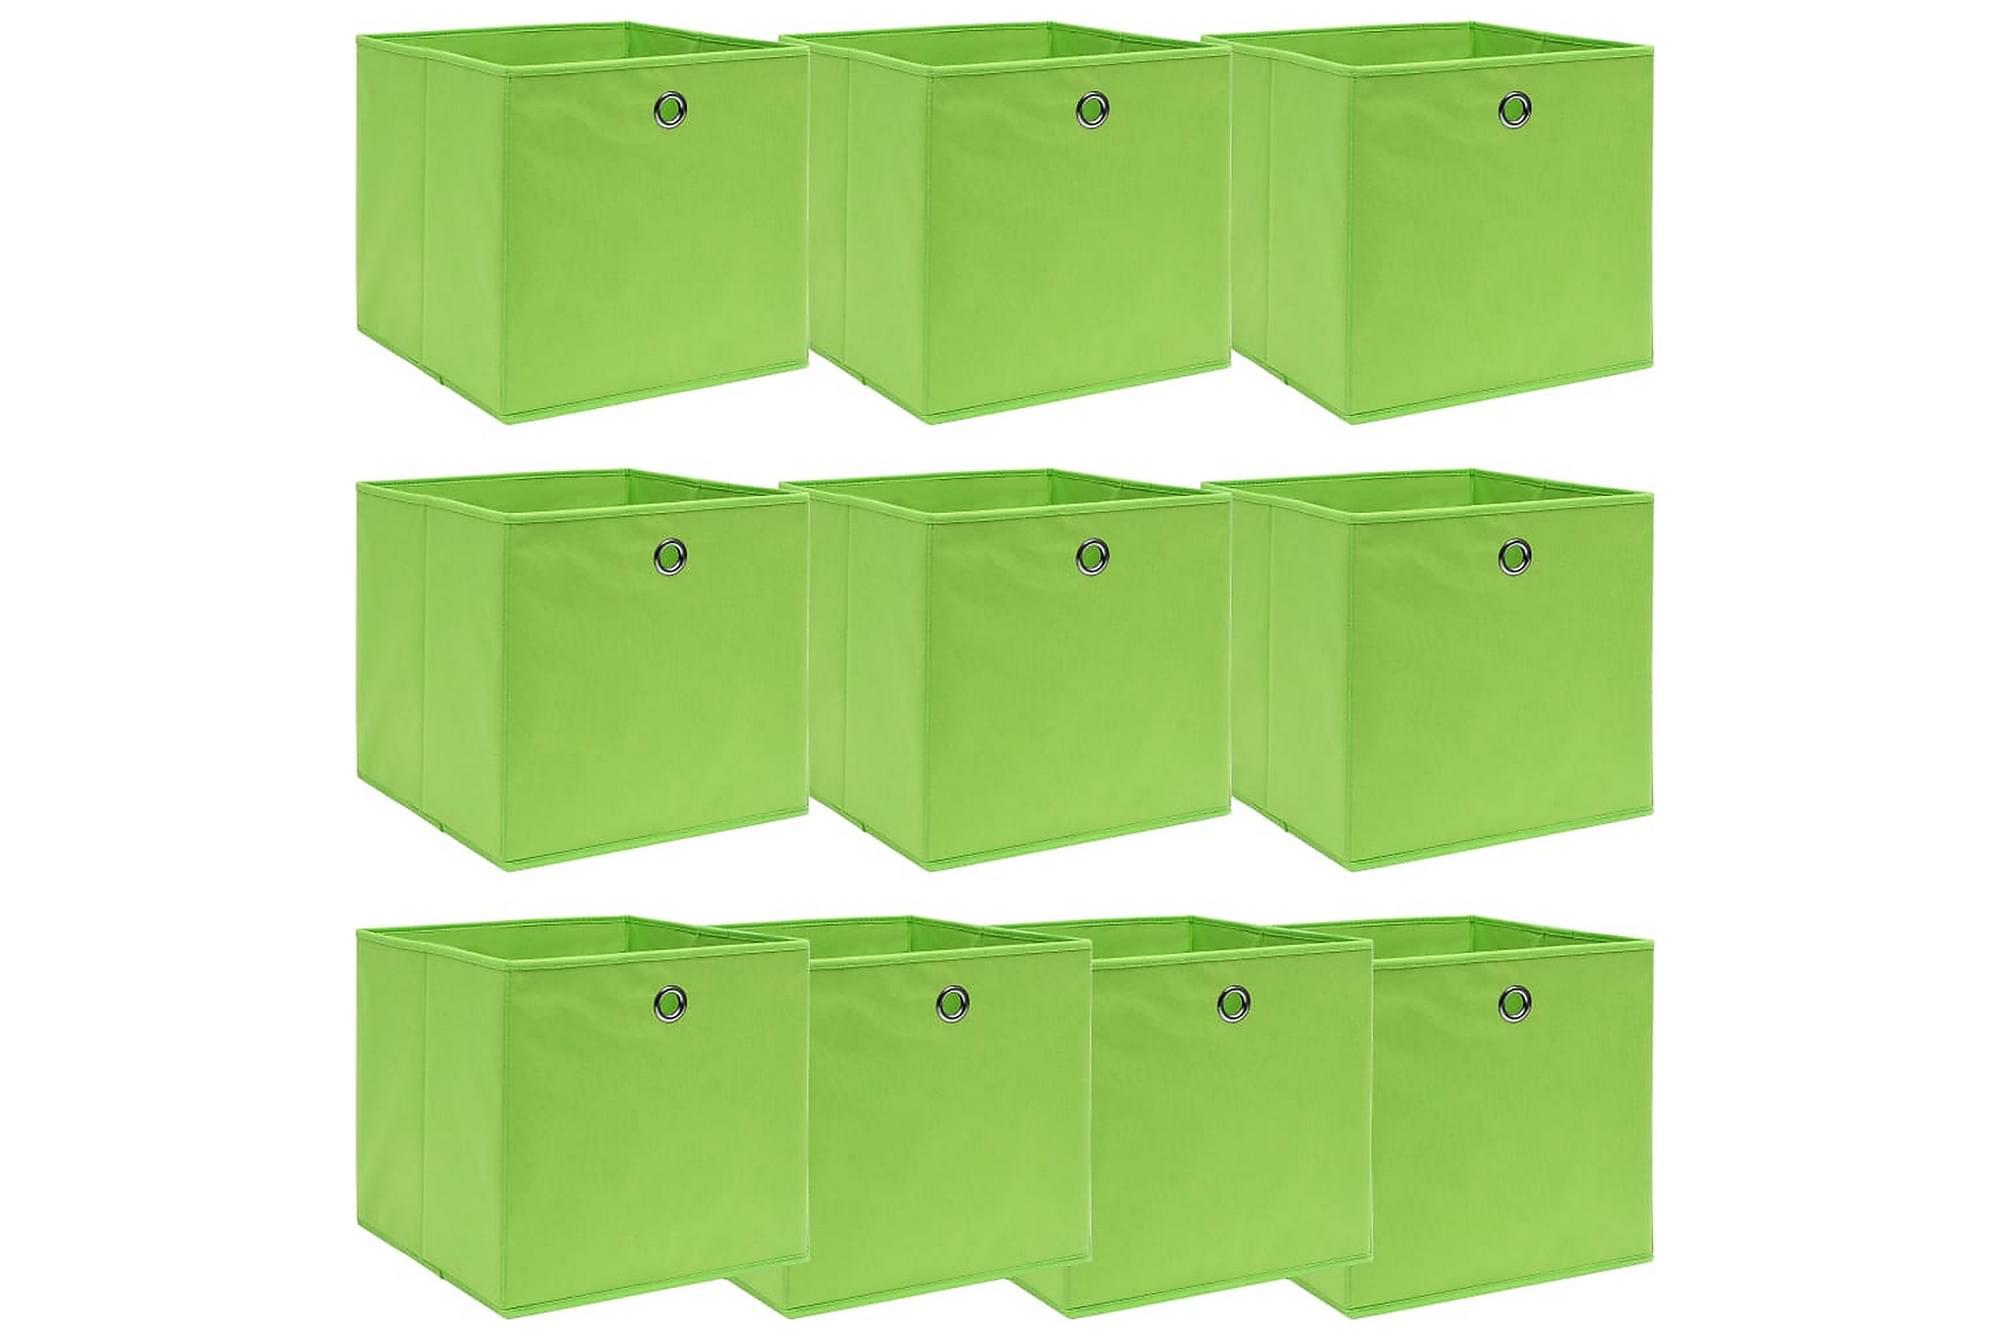 Förvaringslådor 10 st grön 32x32x32 cm tyg, Förvaringslådor & korgar